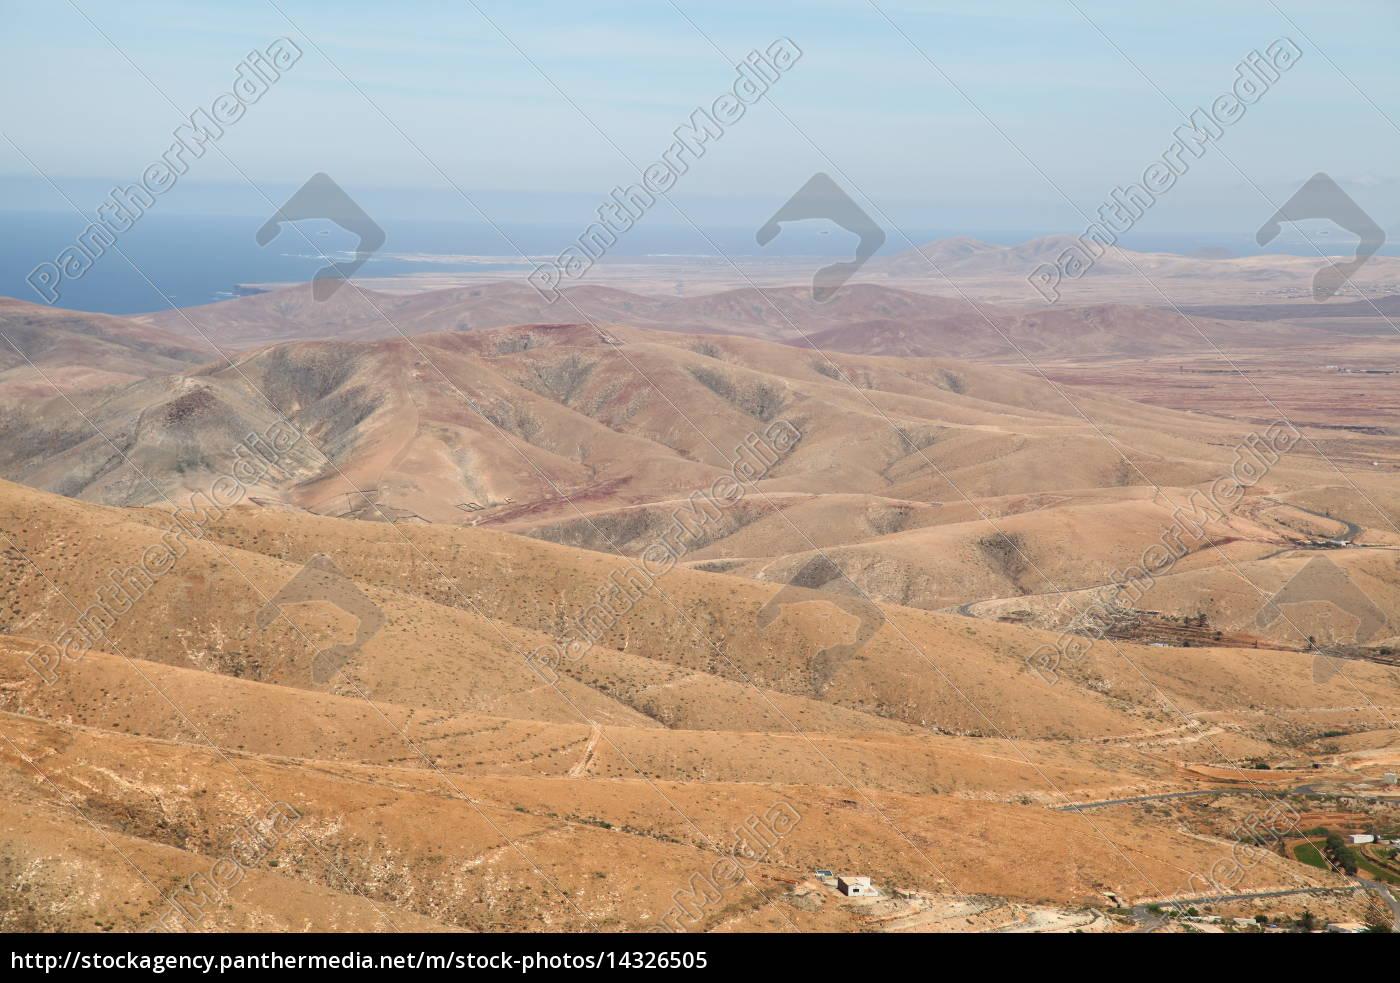 Fuerteventura, Kanarischen Inseln, Kanaren, Panorama, Berge, Hügel - 14326505